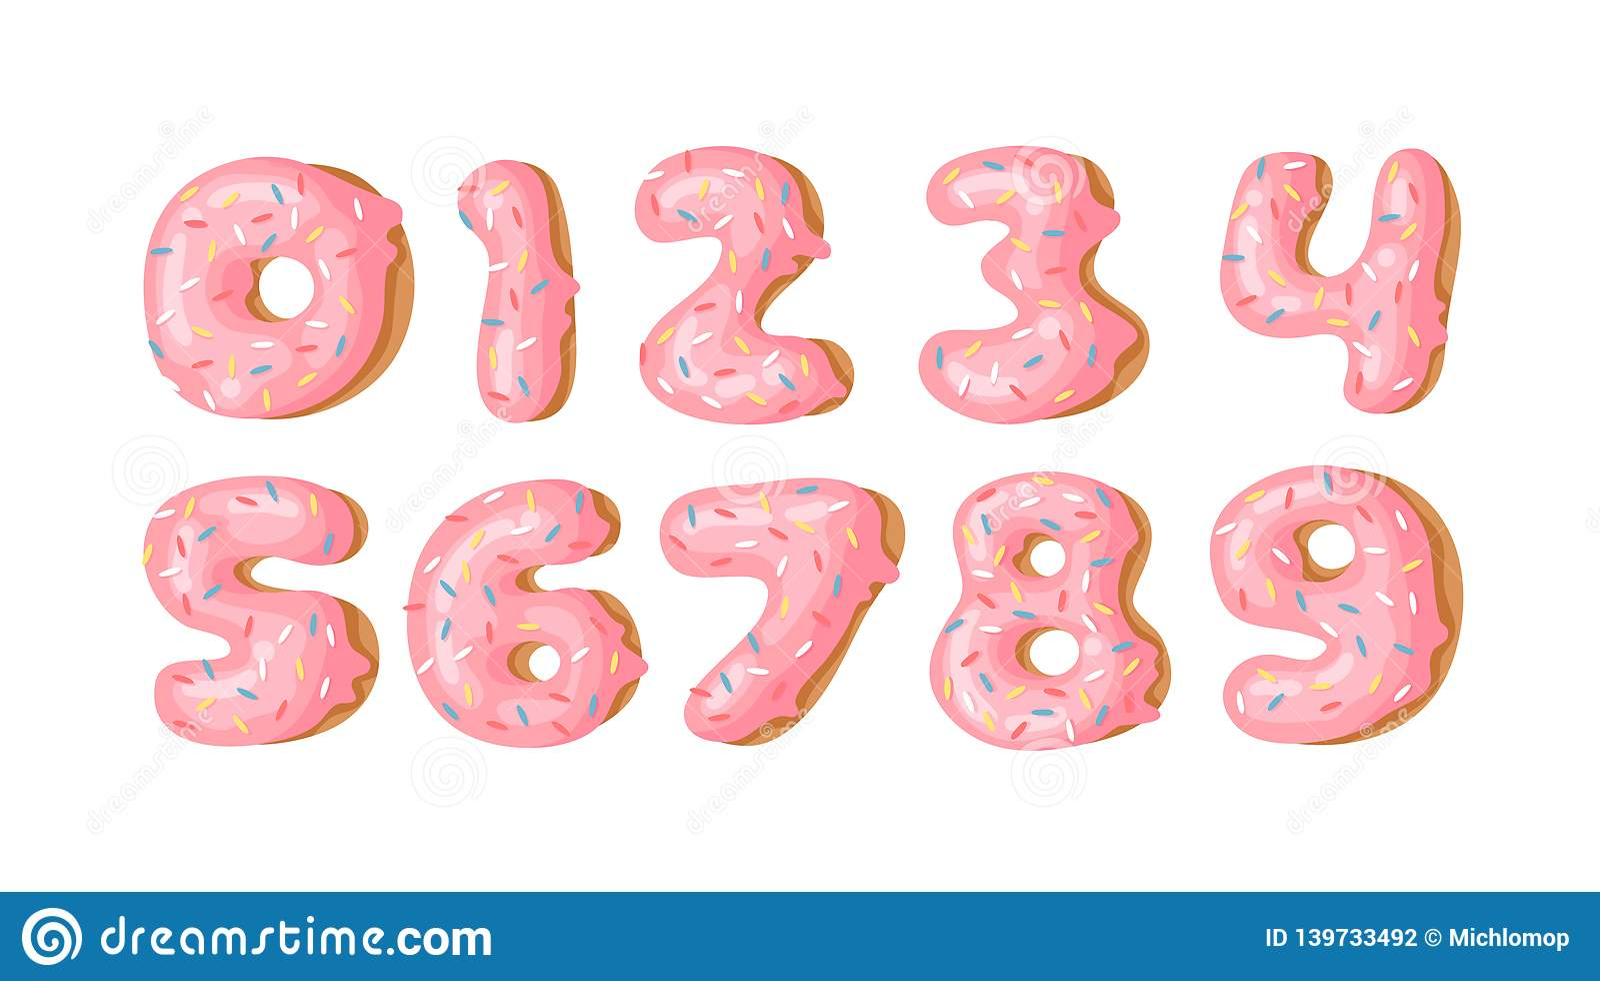 Cartoon vector illustration donut. Hand drawn set of numbers with sweet bun. Actual Creative art work bake